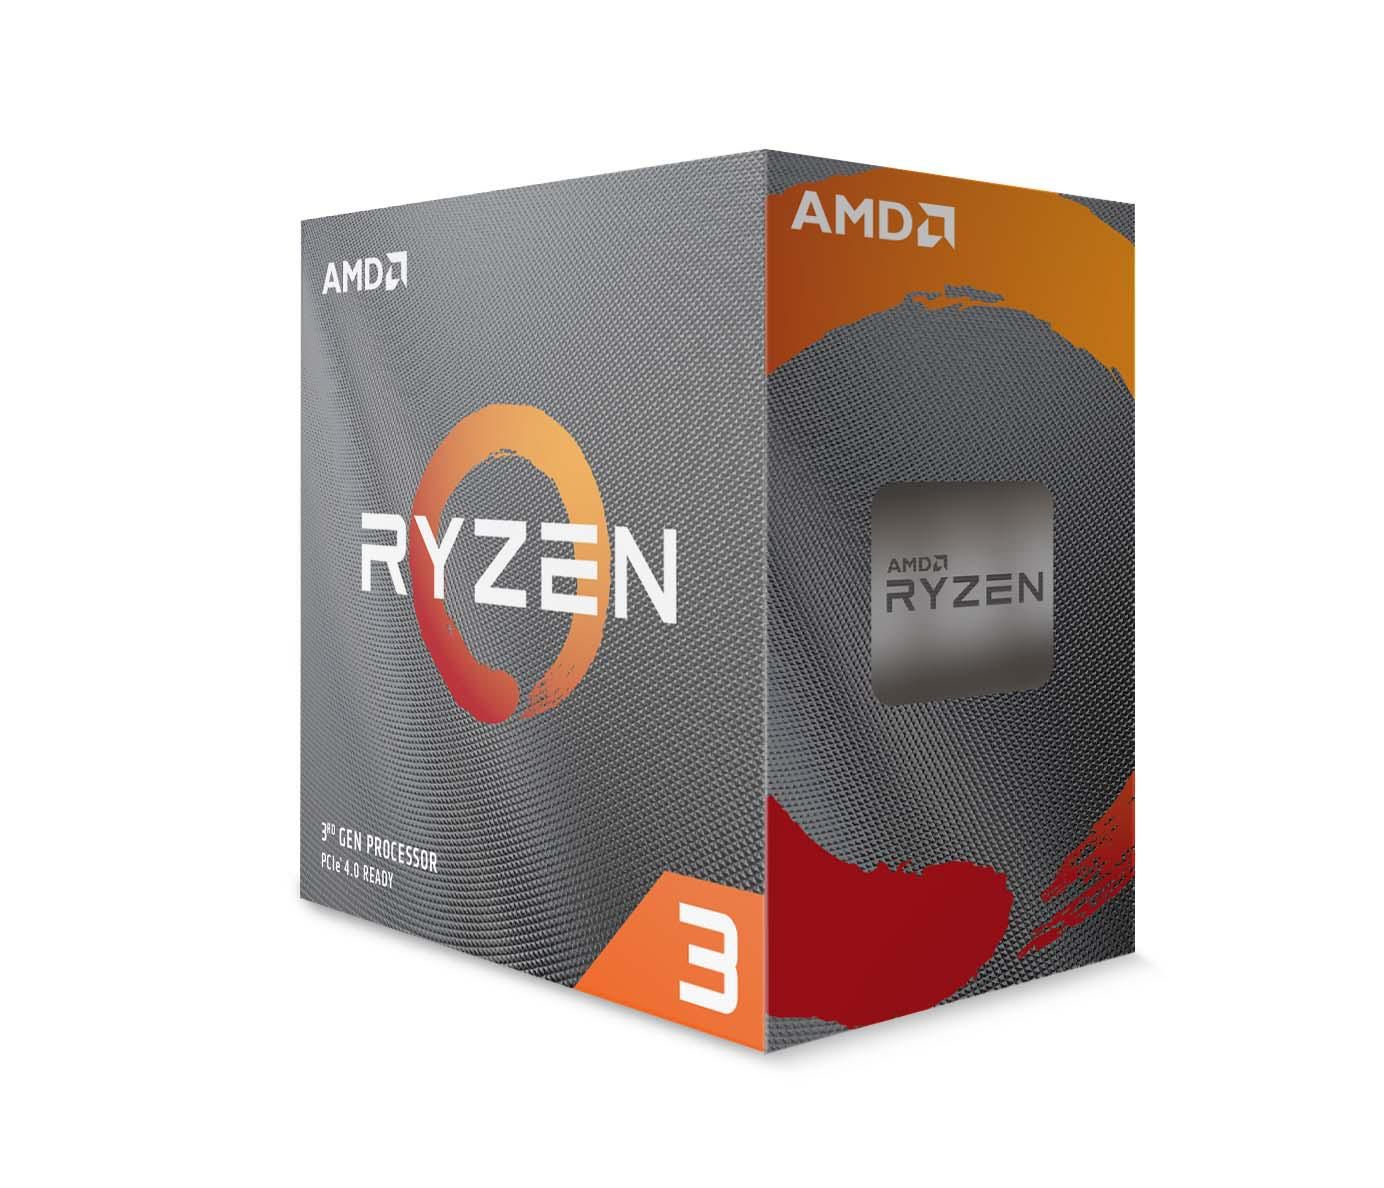 AMD Ryzen 3 3100 3.6 GHz Quad-Core Processor